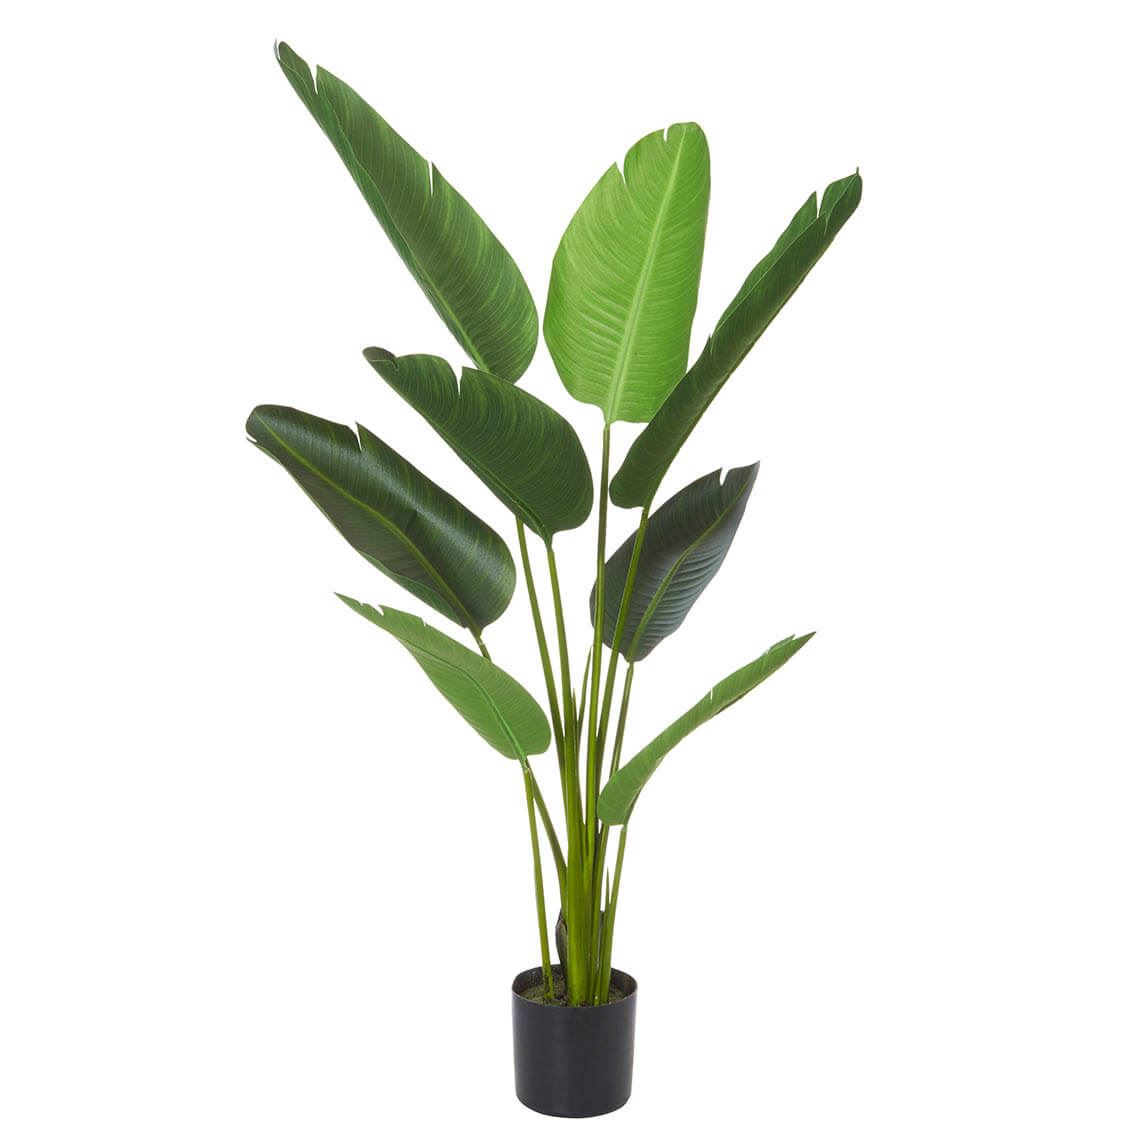 Giant Bird Of Paradise Plant Size W 78cm x D 78cm x H 122cm in Green Freedom